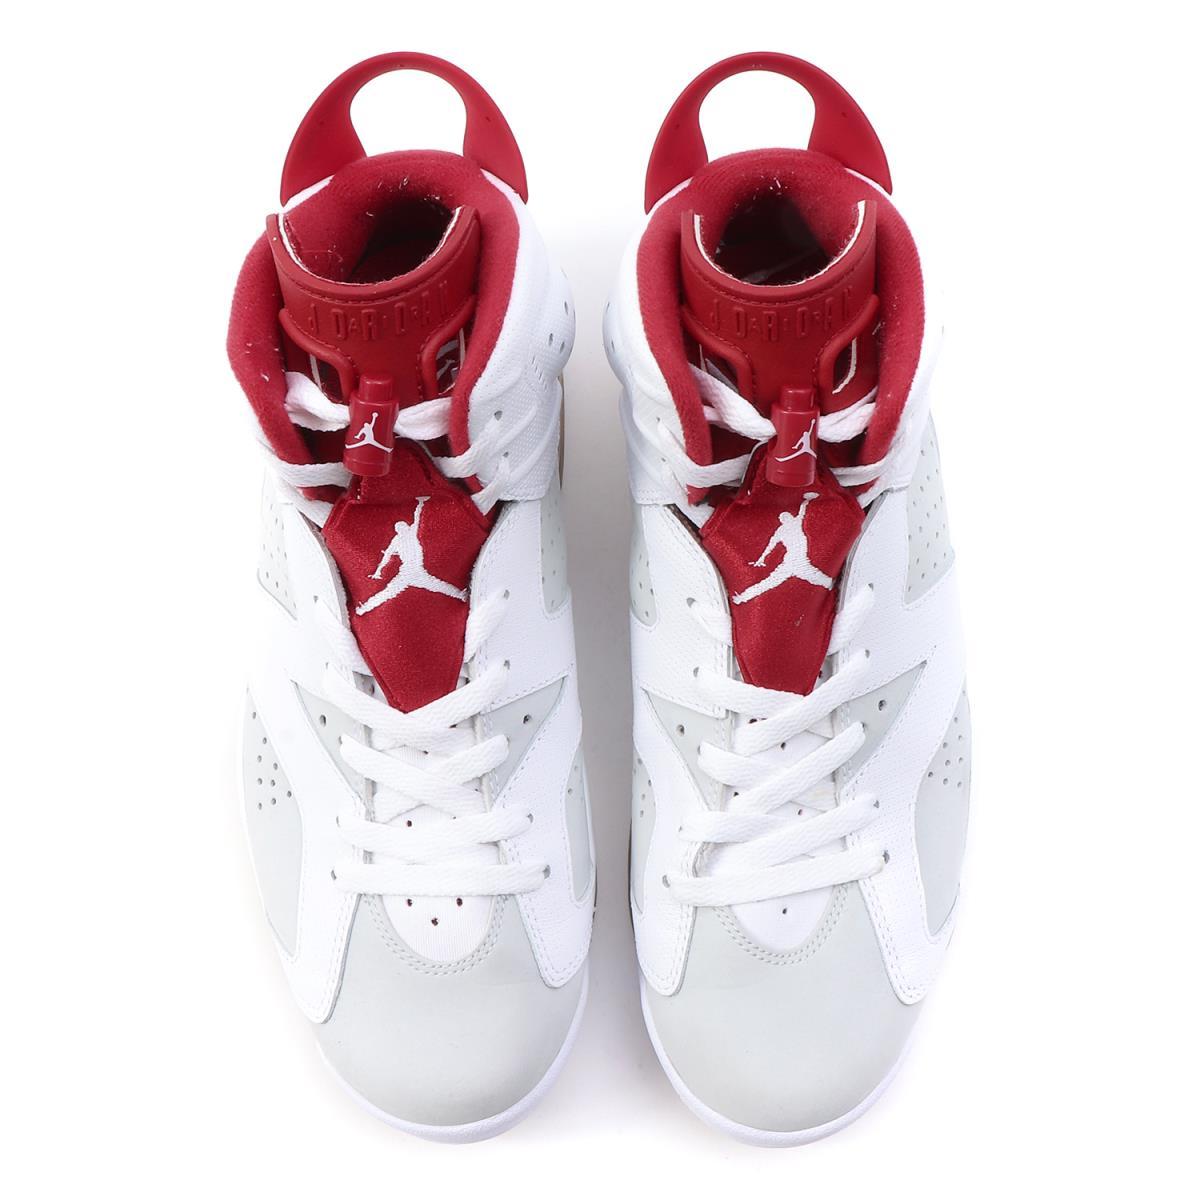 BEEGLE by Boo-Bee  NIKE (Nike) AIR JORDAN 6 RETRO ALTERNATE HARE ... 8f40f5431